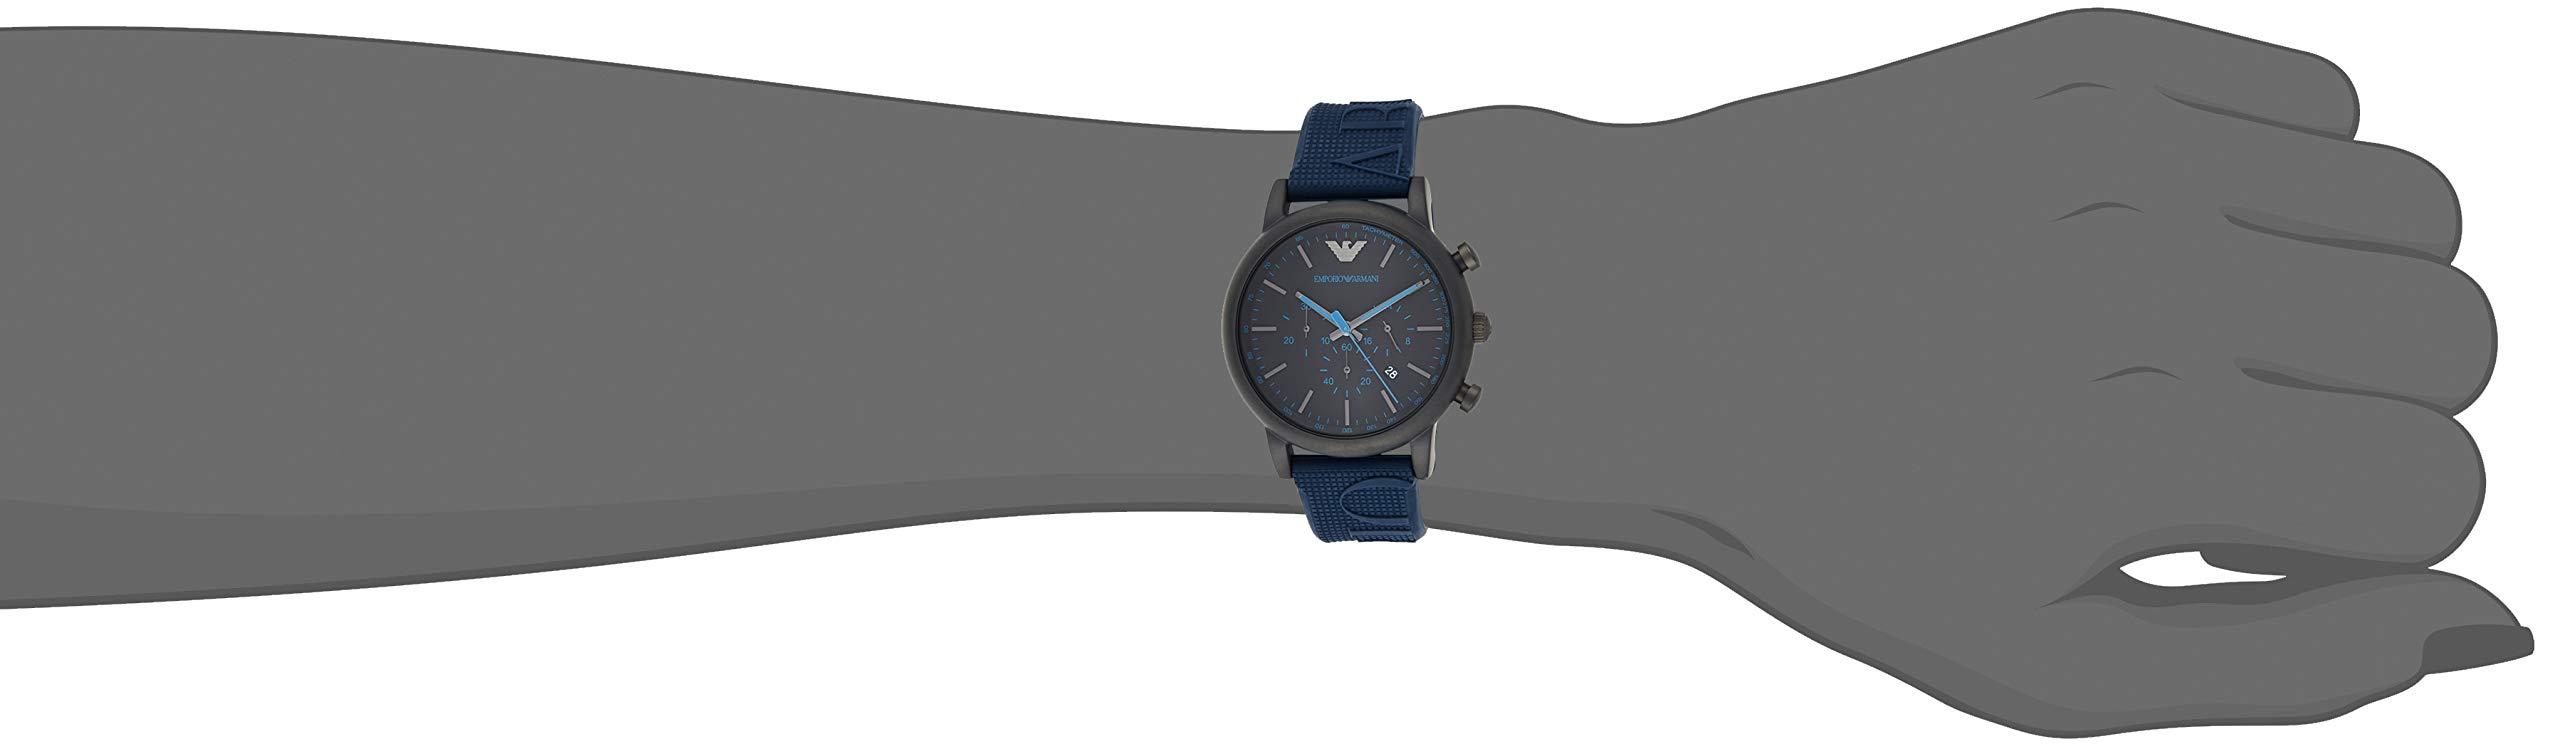 Emporio Armani Reloj Cronógrafo para Hombre de Cuarzo con Correa en Silicona